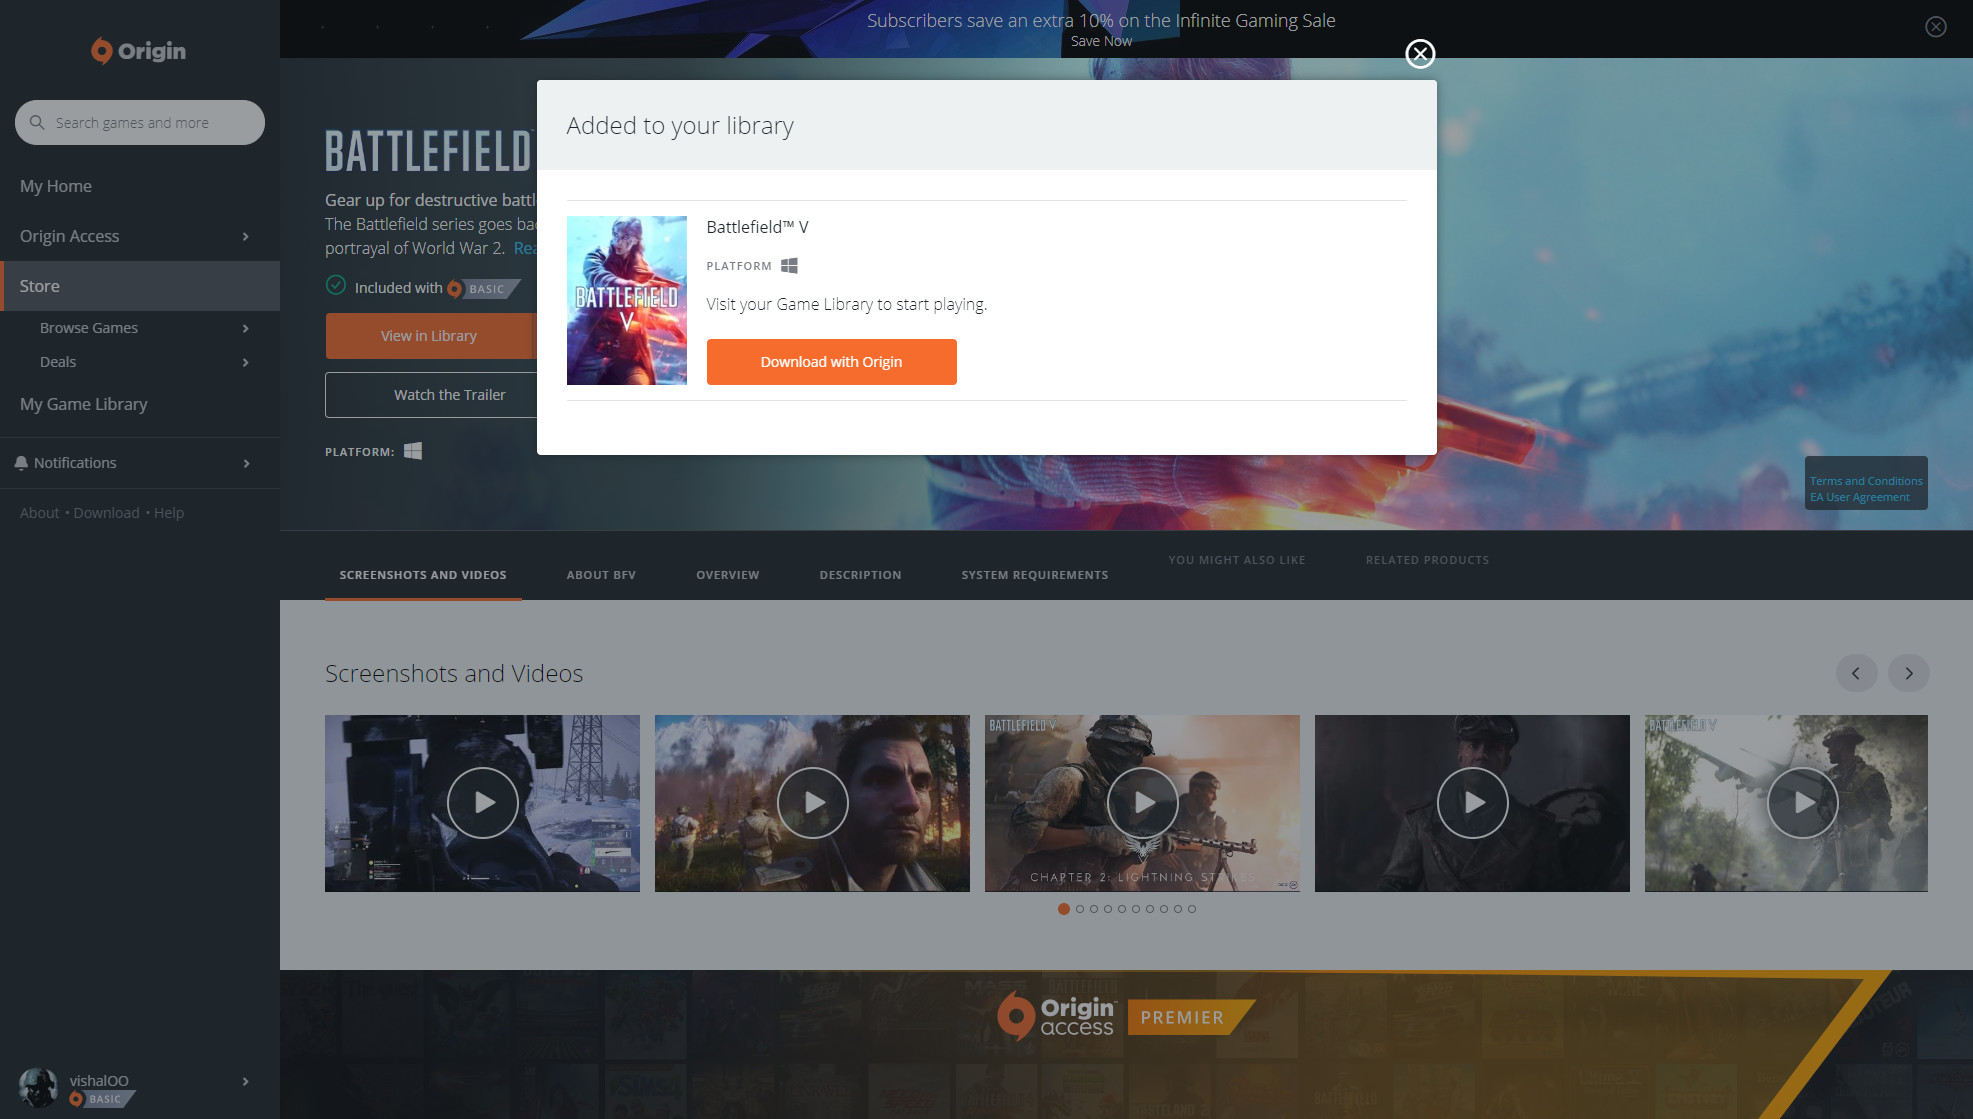 Battlefield V joins Origin Access Basic subscription, no longer